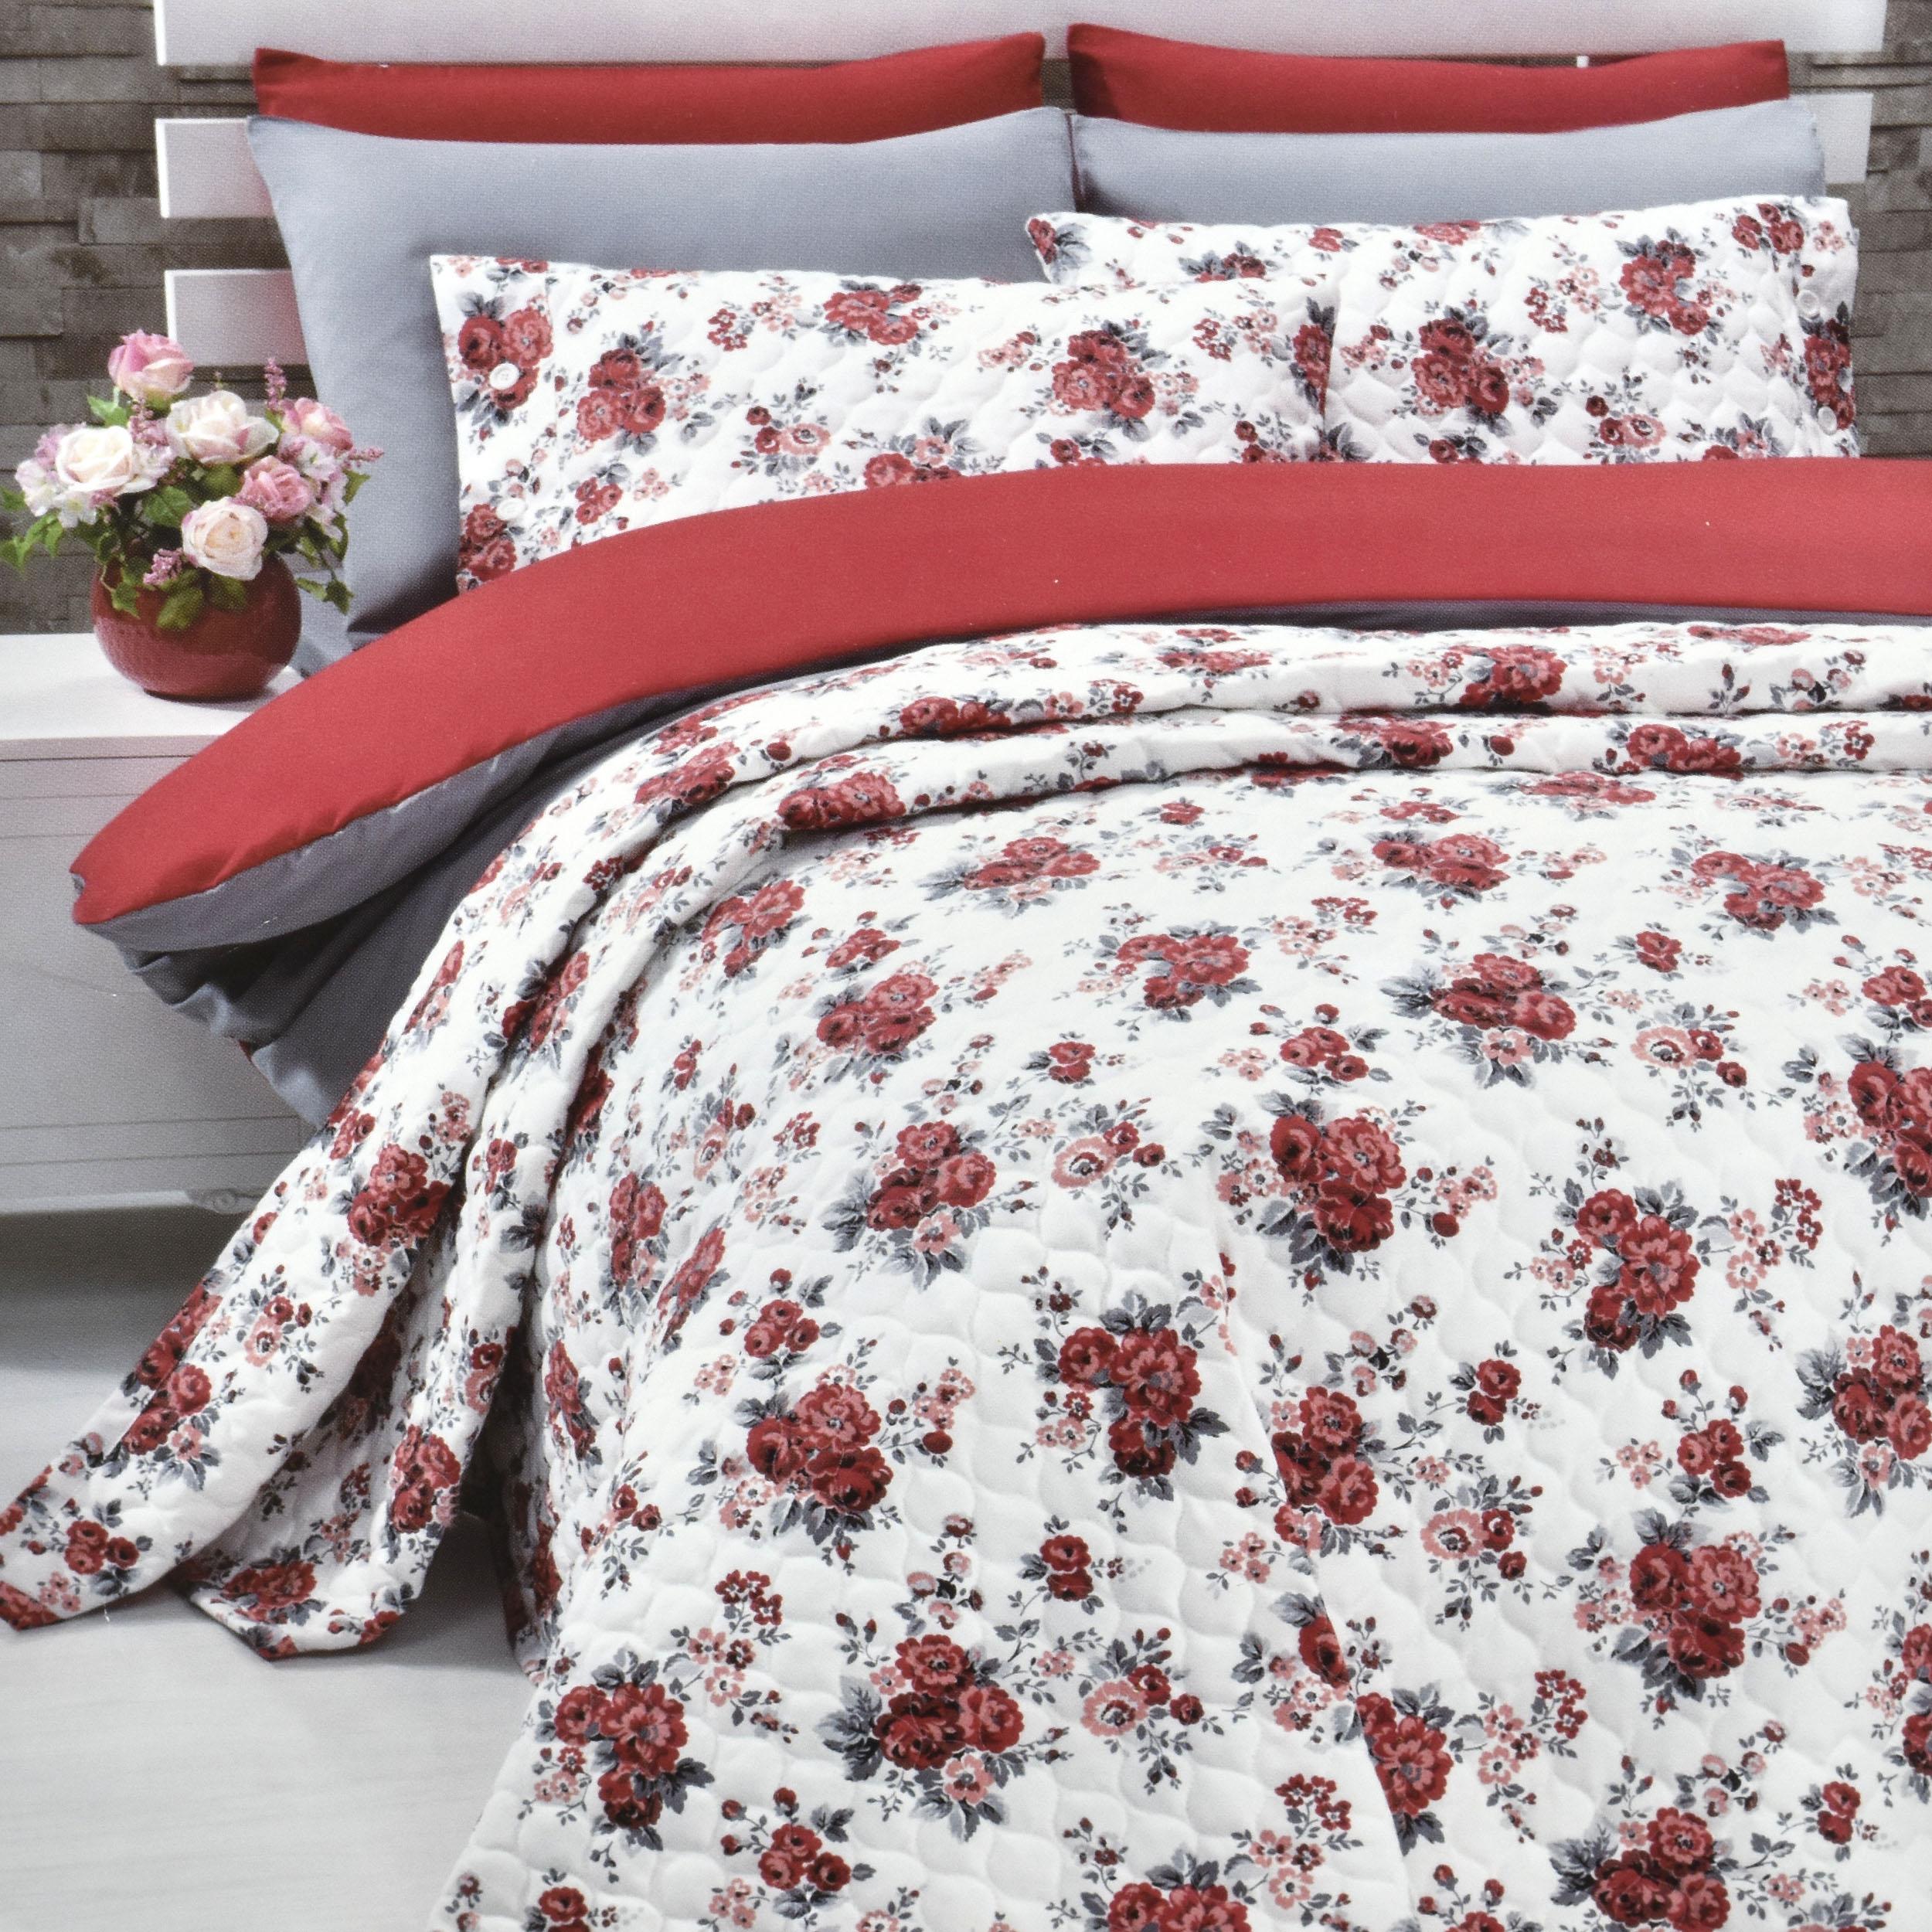 سرویس خواب کوپن سری پاناماست طرح Kırmızı دو نفره 7 تکه